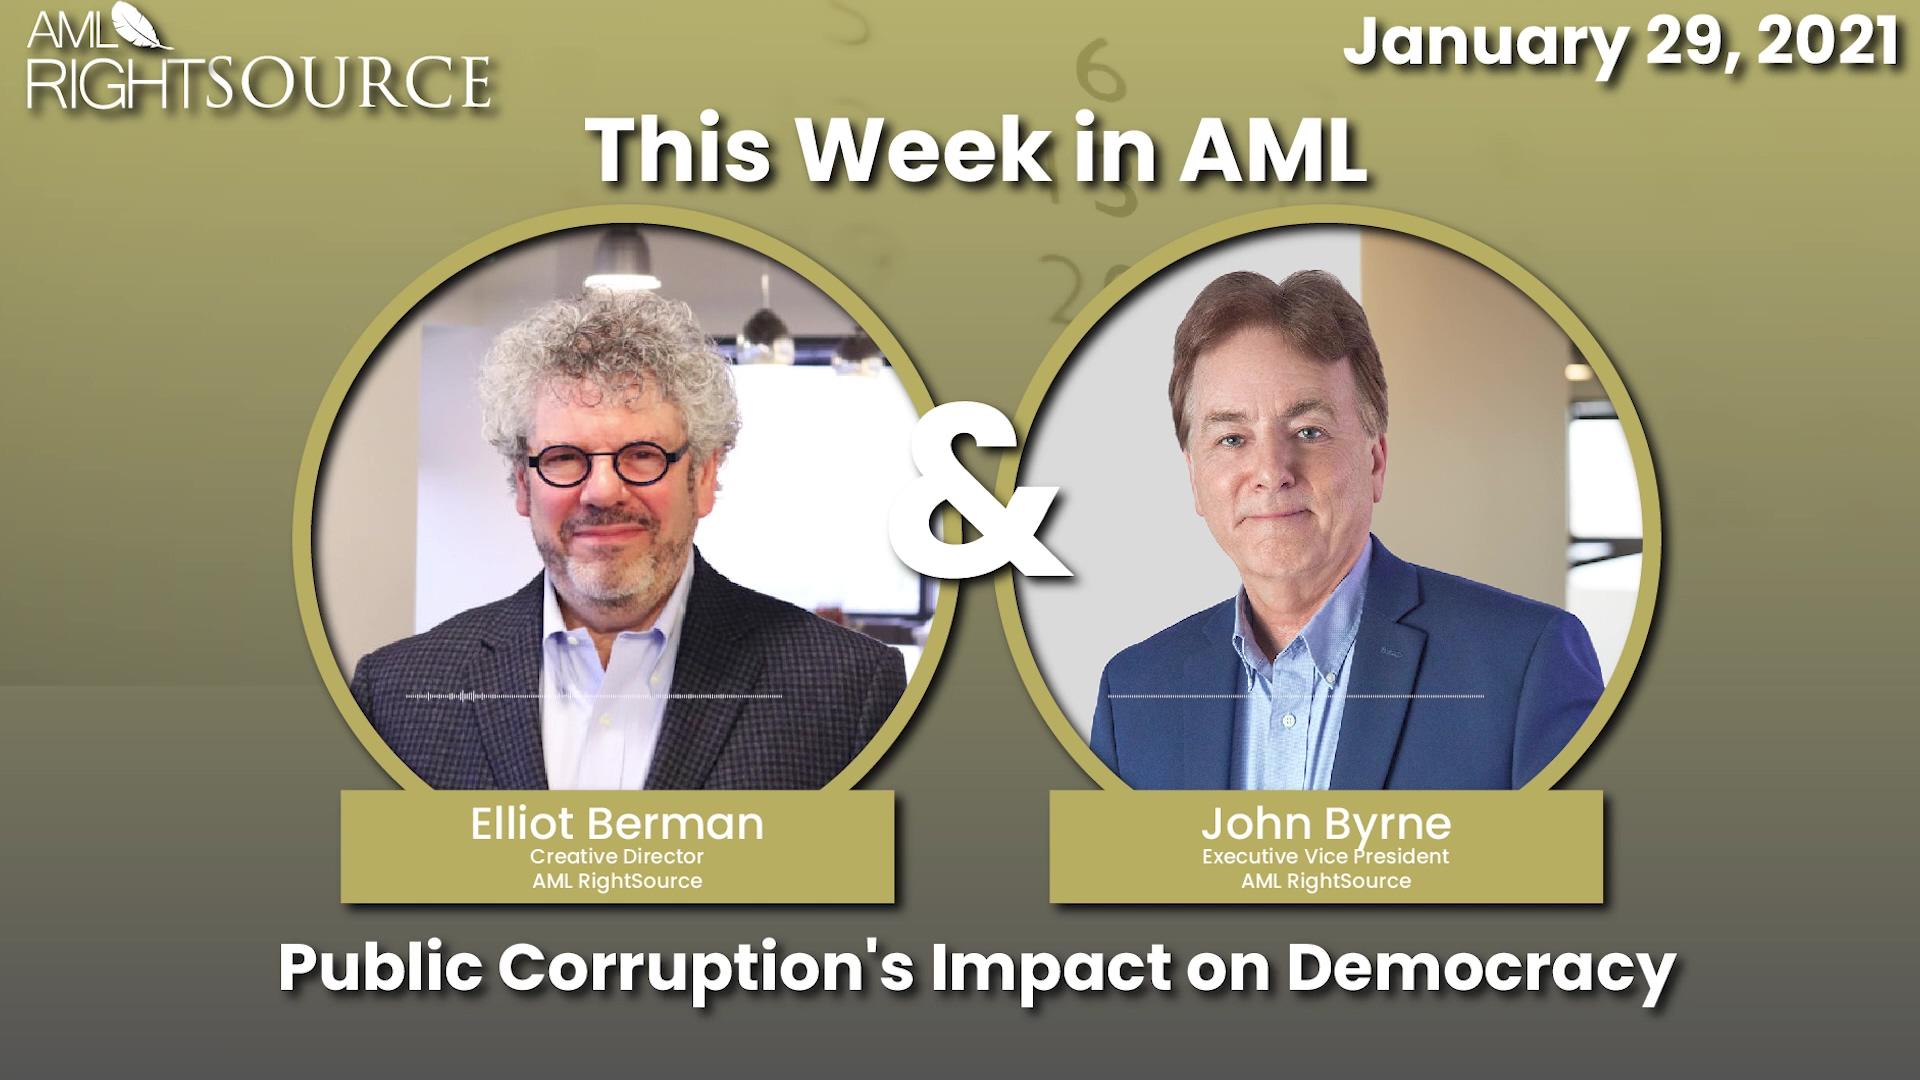 Public Corruptions Impact on Democracy